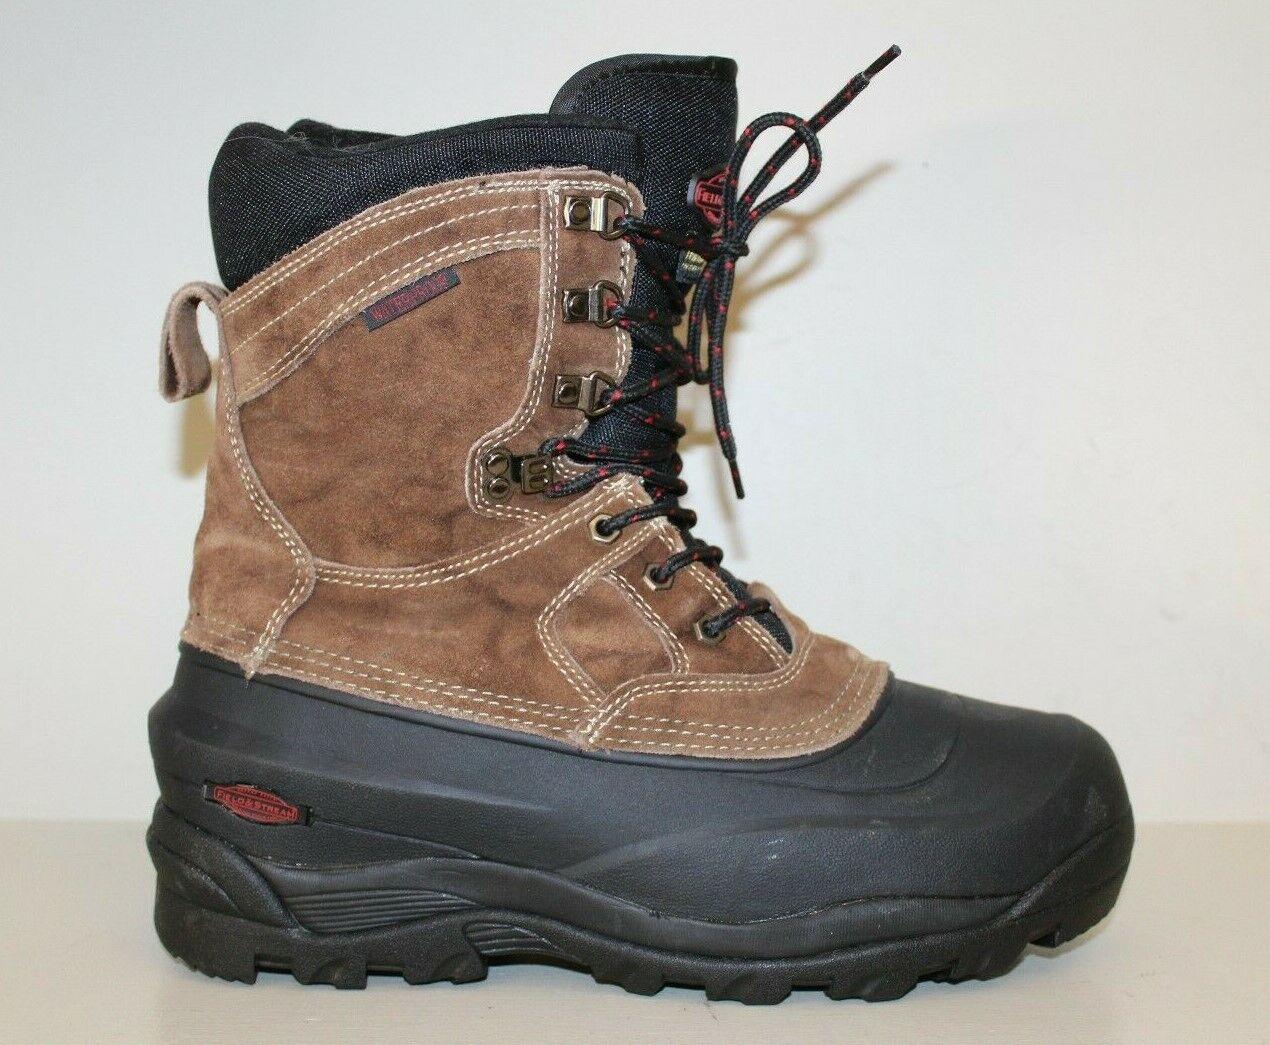 & Stream para hombre Ice Field Field RIO SC frío WP II Cazar botas Sz 10